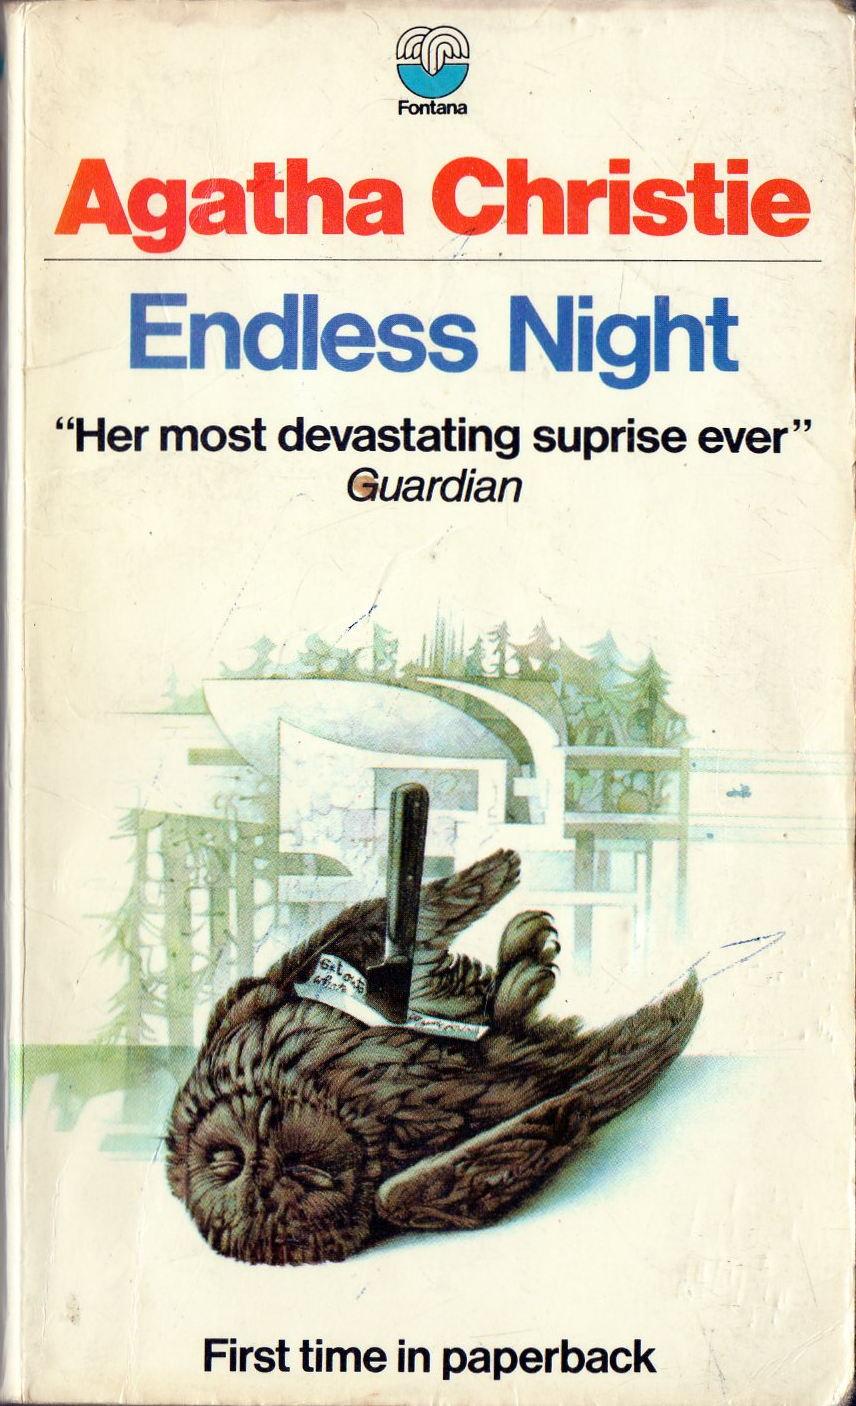 Agatha Christie Tom Adams Endless Night Fontana 1970